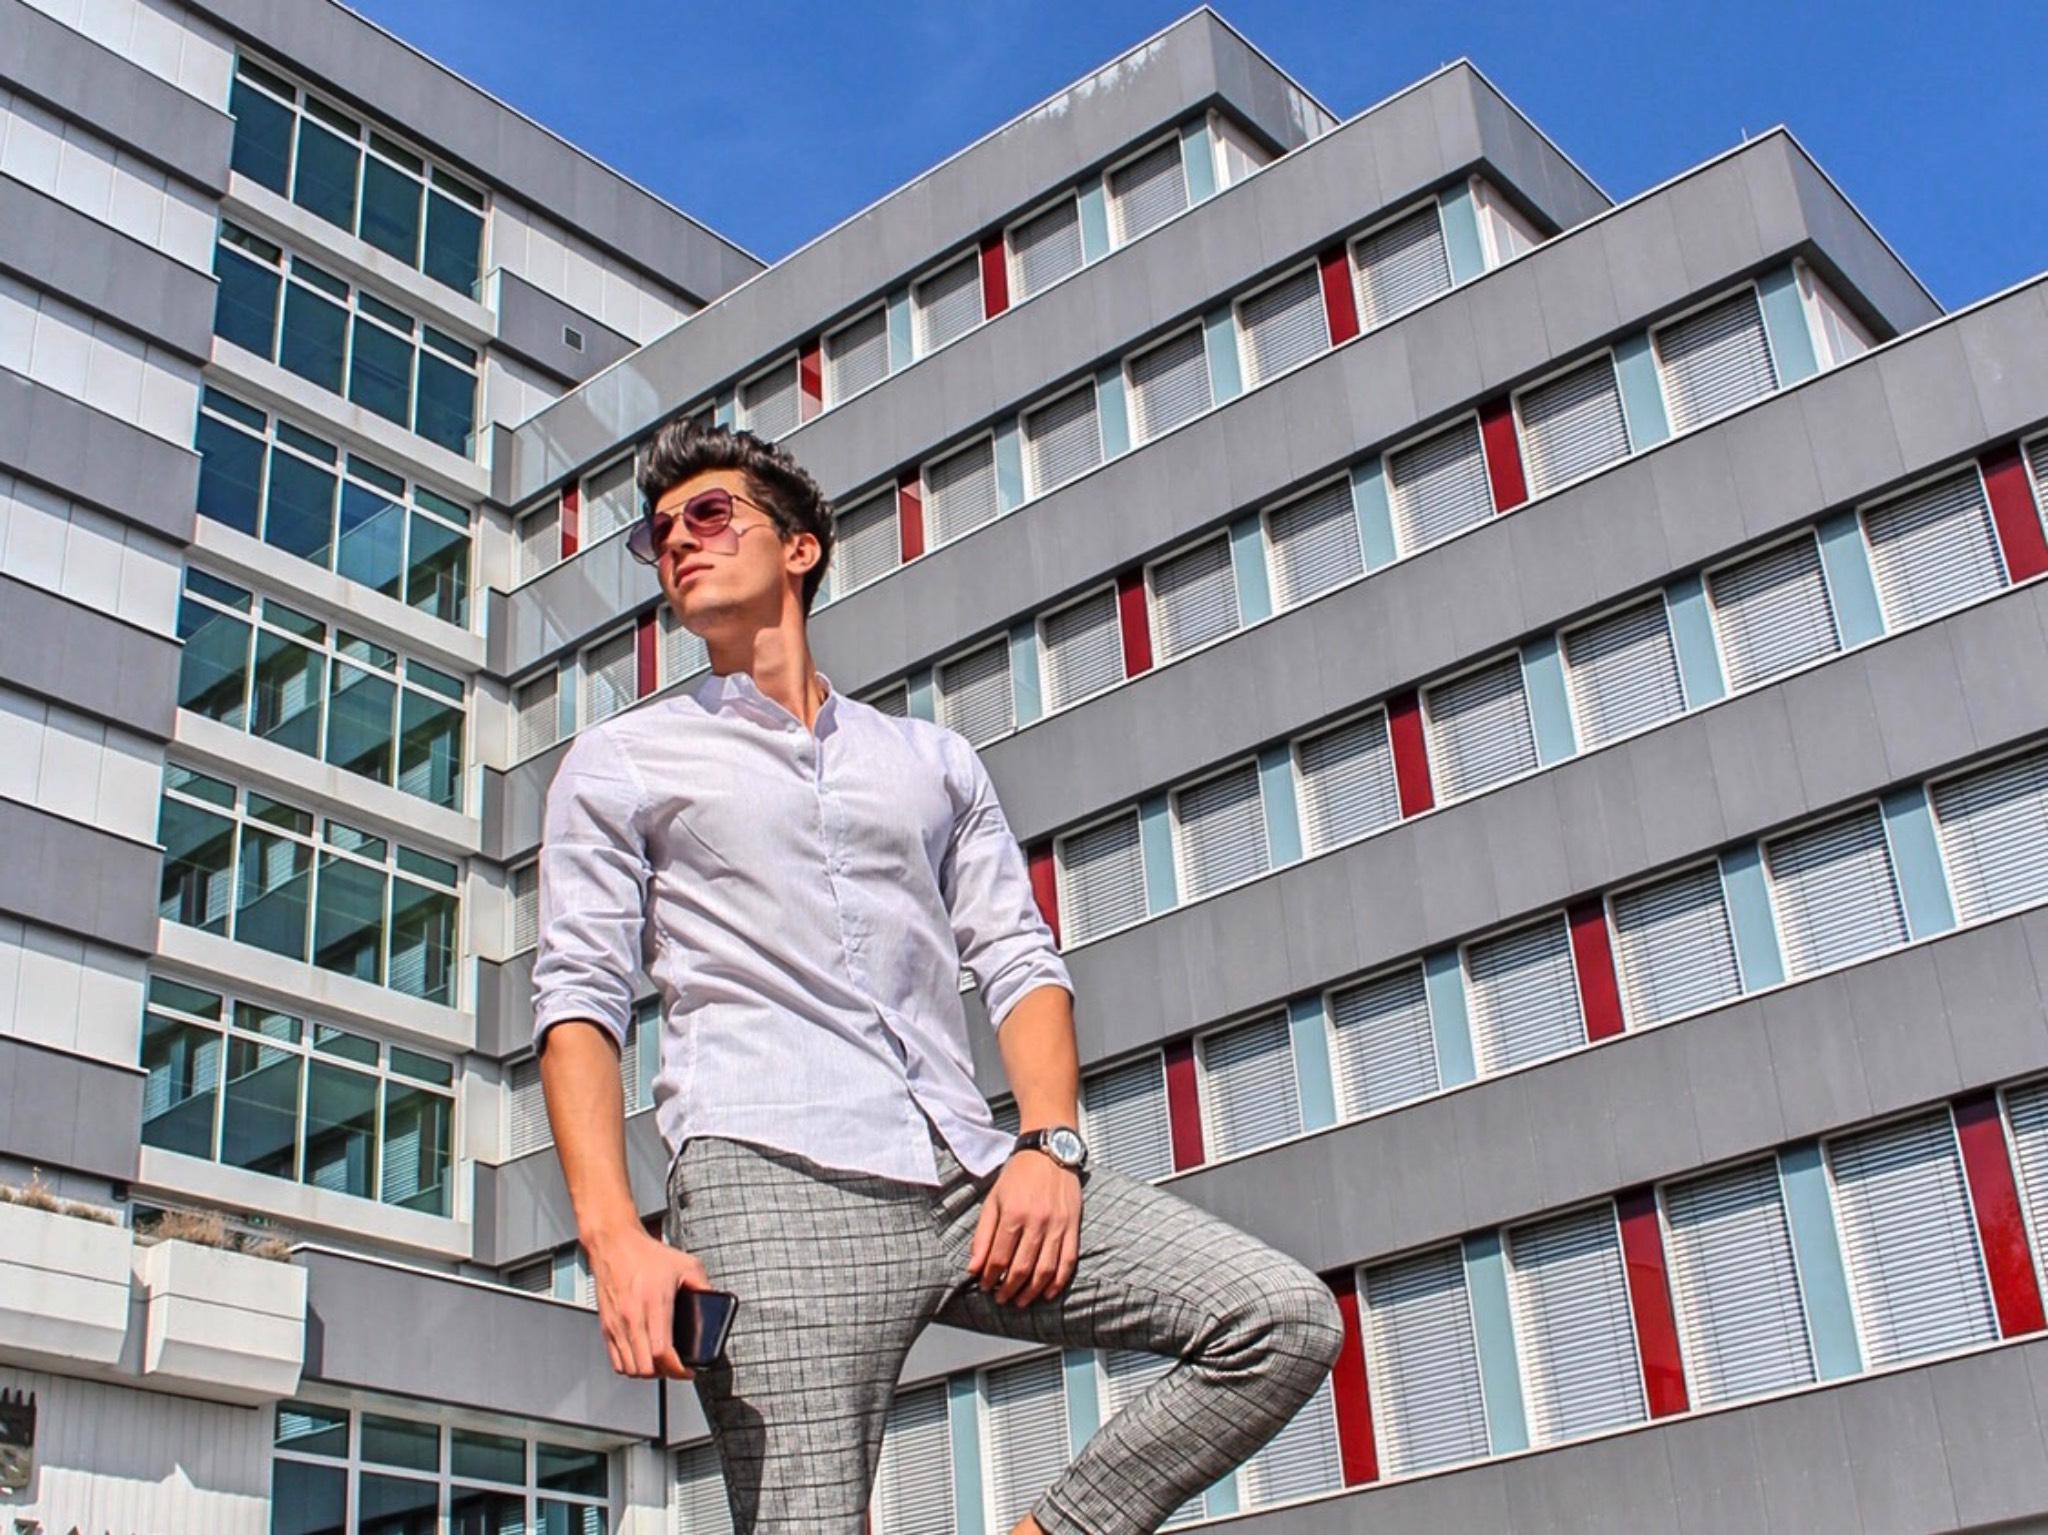 Er studiert in Ansbach. Foto: Houssem Mnejja